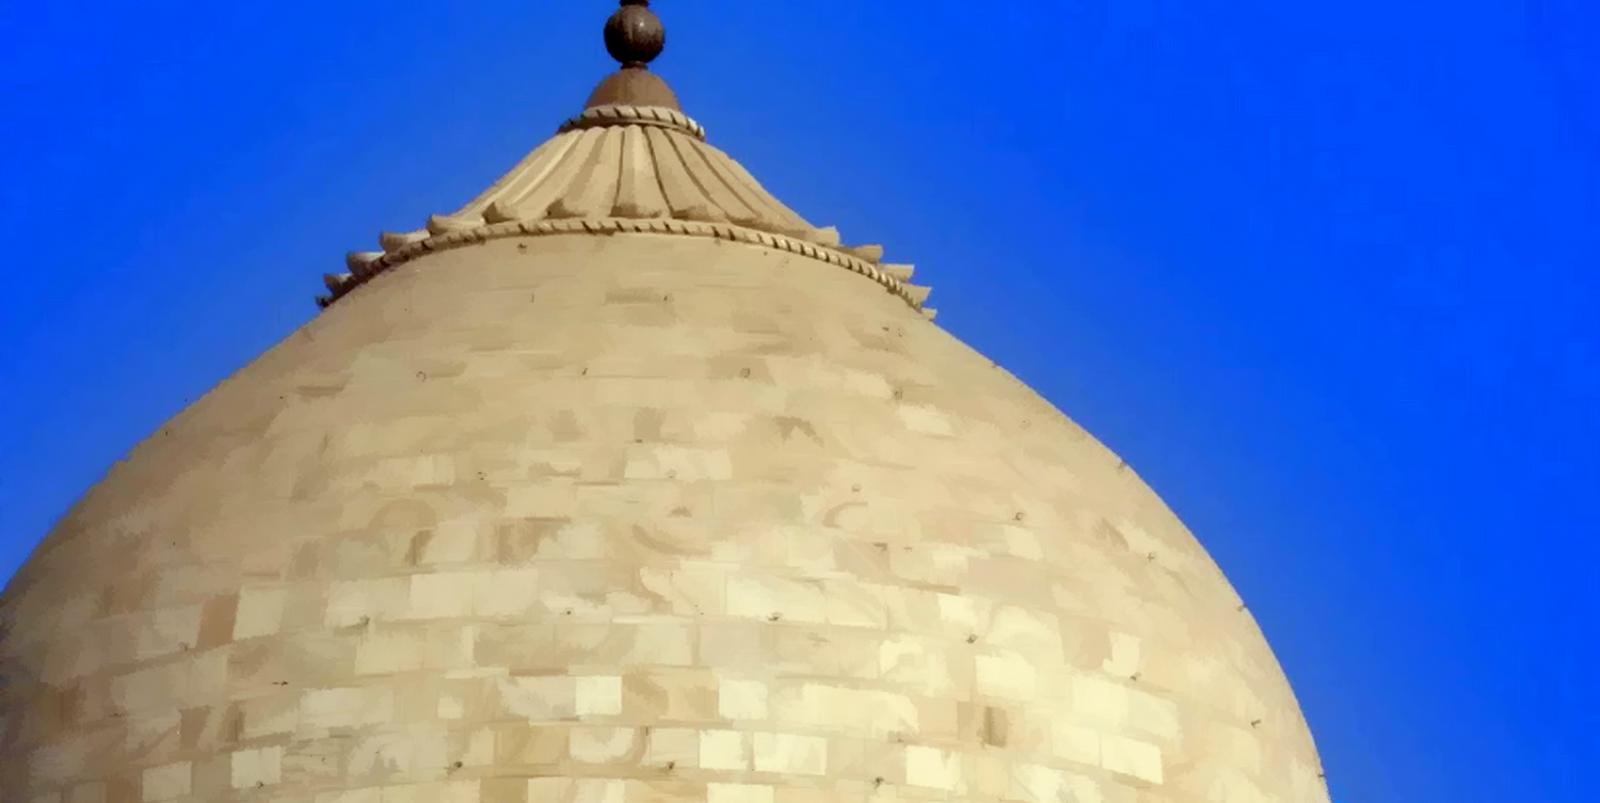 10 Fakta Unik dan Menarik dari Taj Mahal